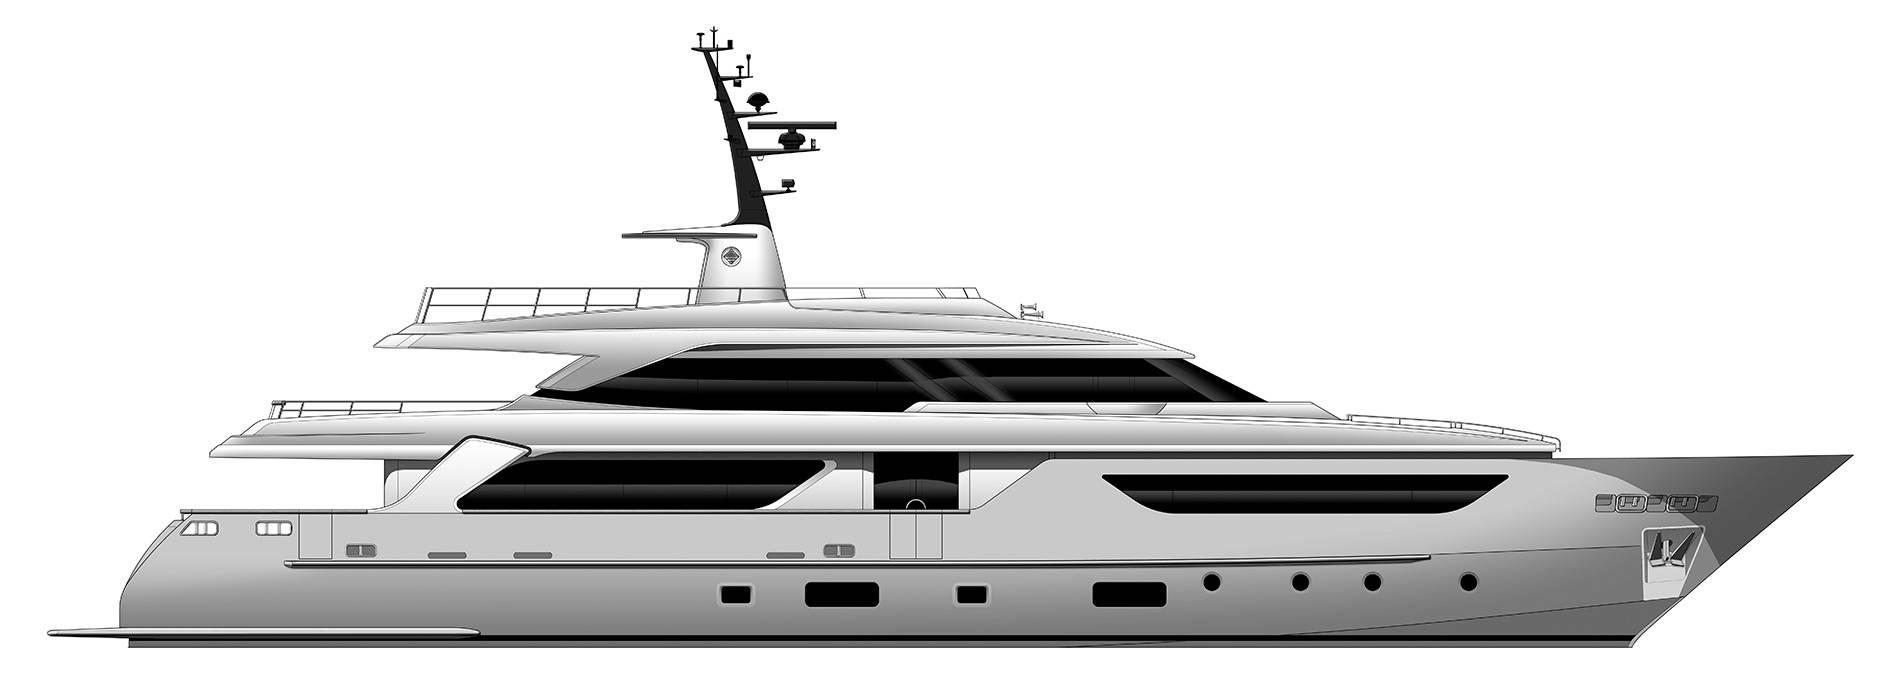 Sanlorenzo Yachts SD126 Профиль